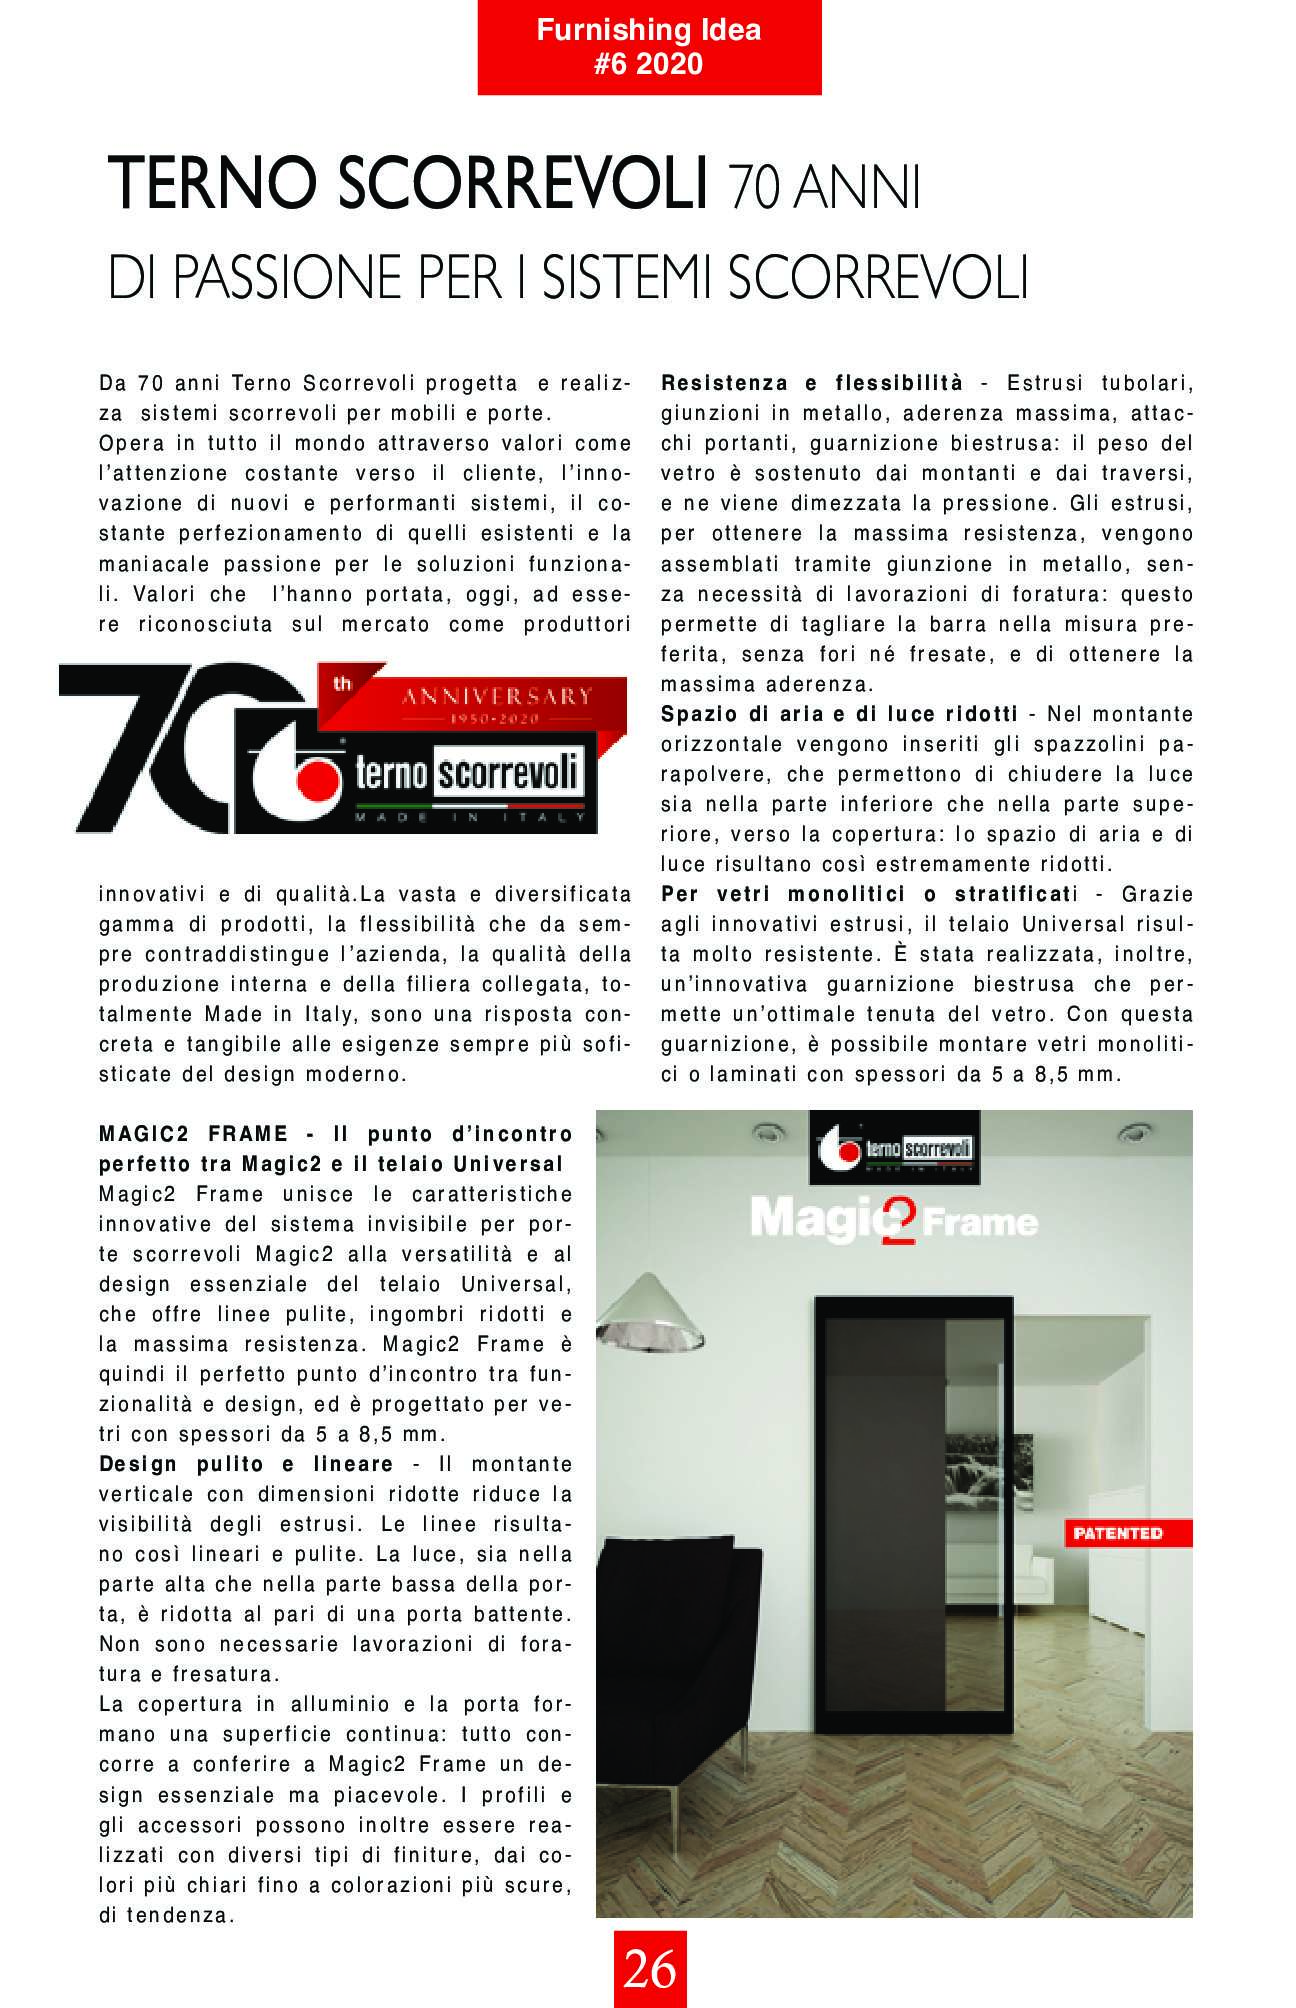 furnishingidea-6-2020_journal_22_025.jpg